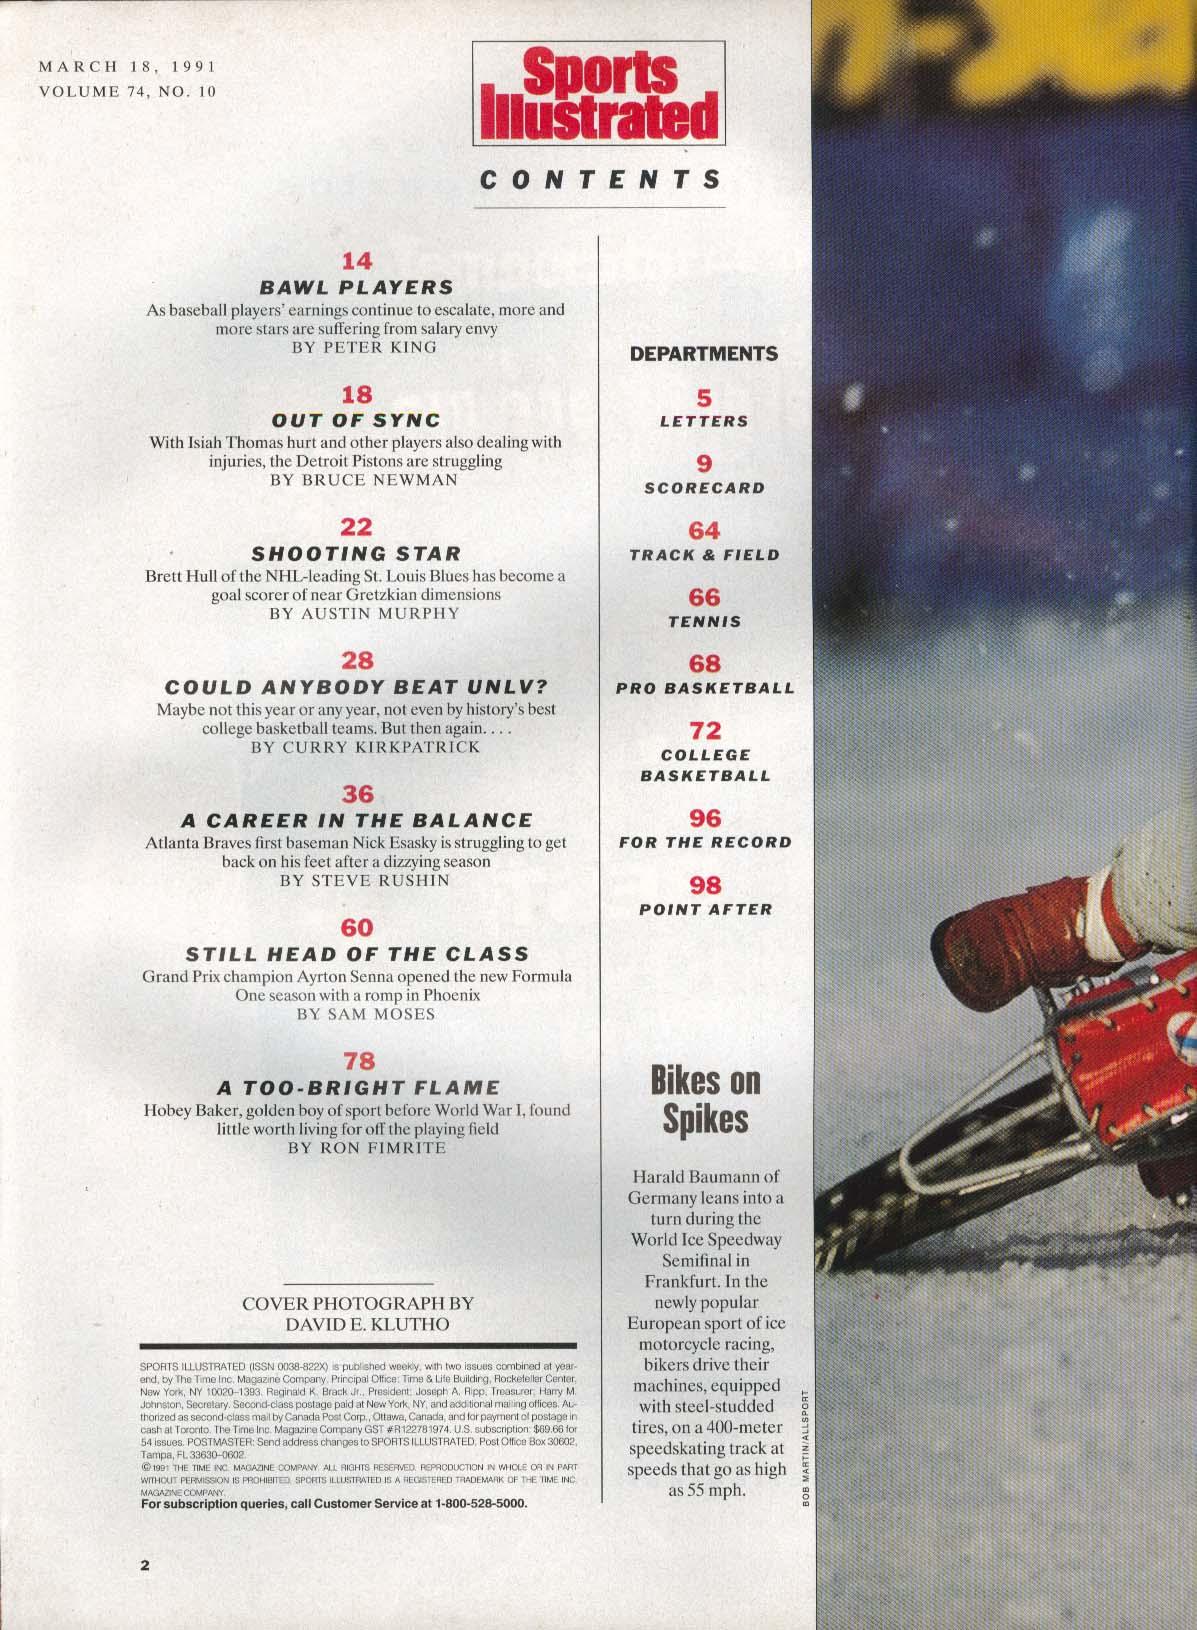 SPORTS ILLUSTRATED Brett Hull Isiah Thomas Nick Esasky Ayrton Senna 3/18 1991